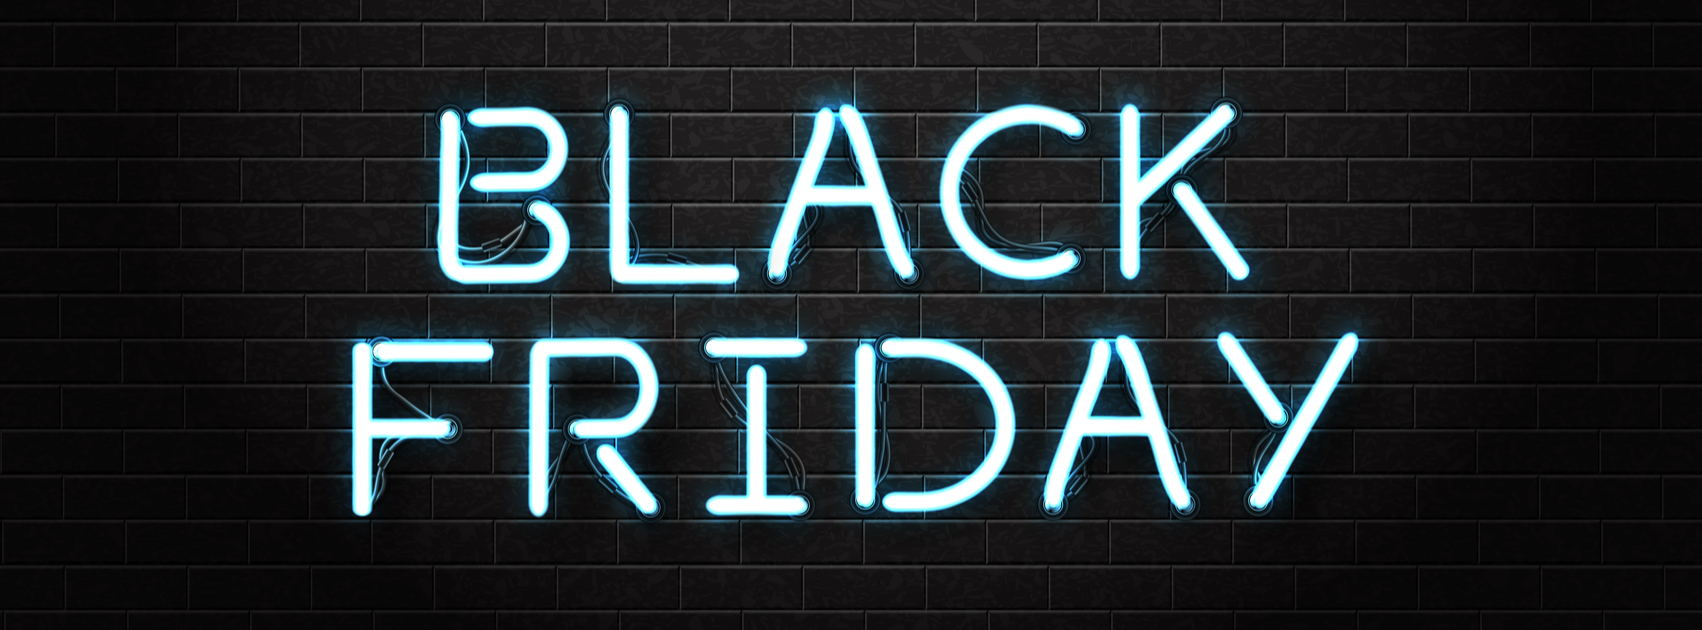 Nordictrack Black Friday Cyber Monday Deals Nordictrackpromocodes Com